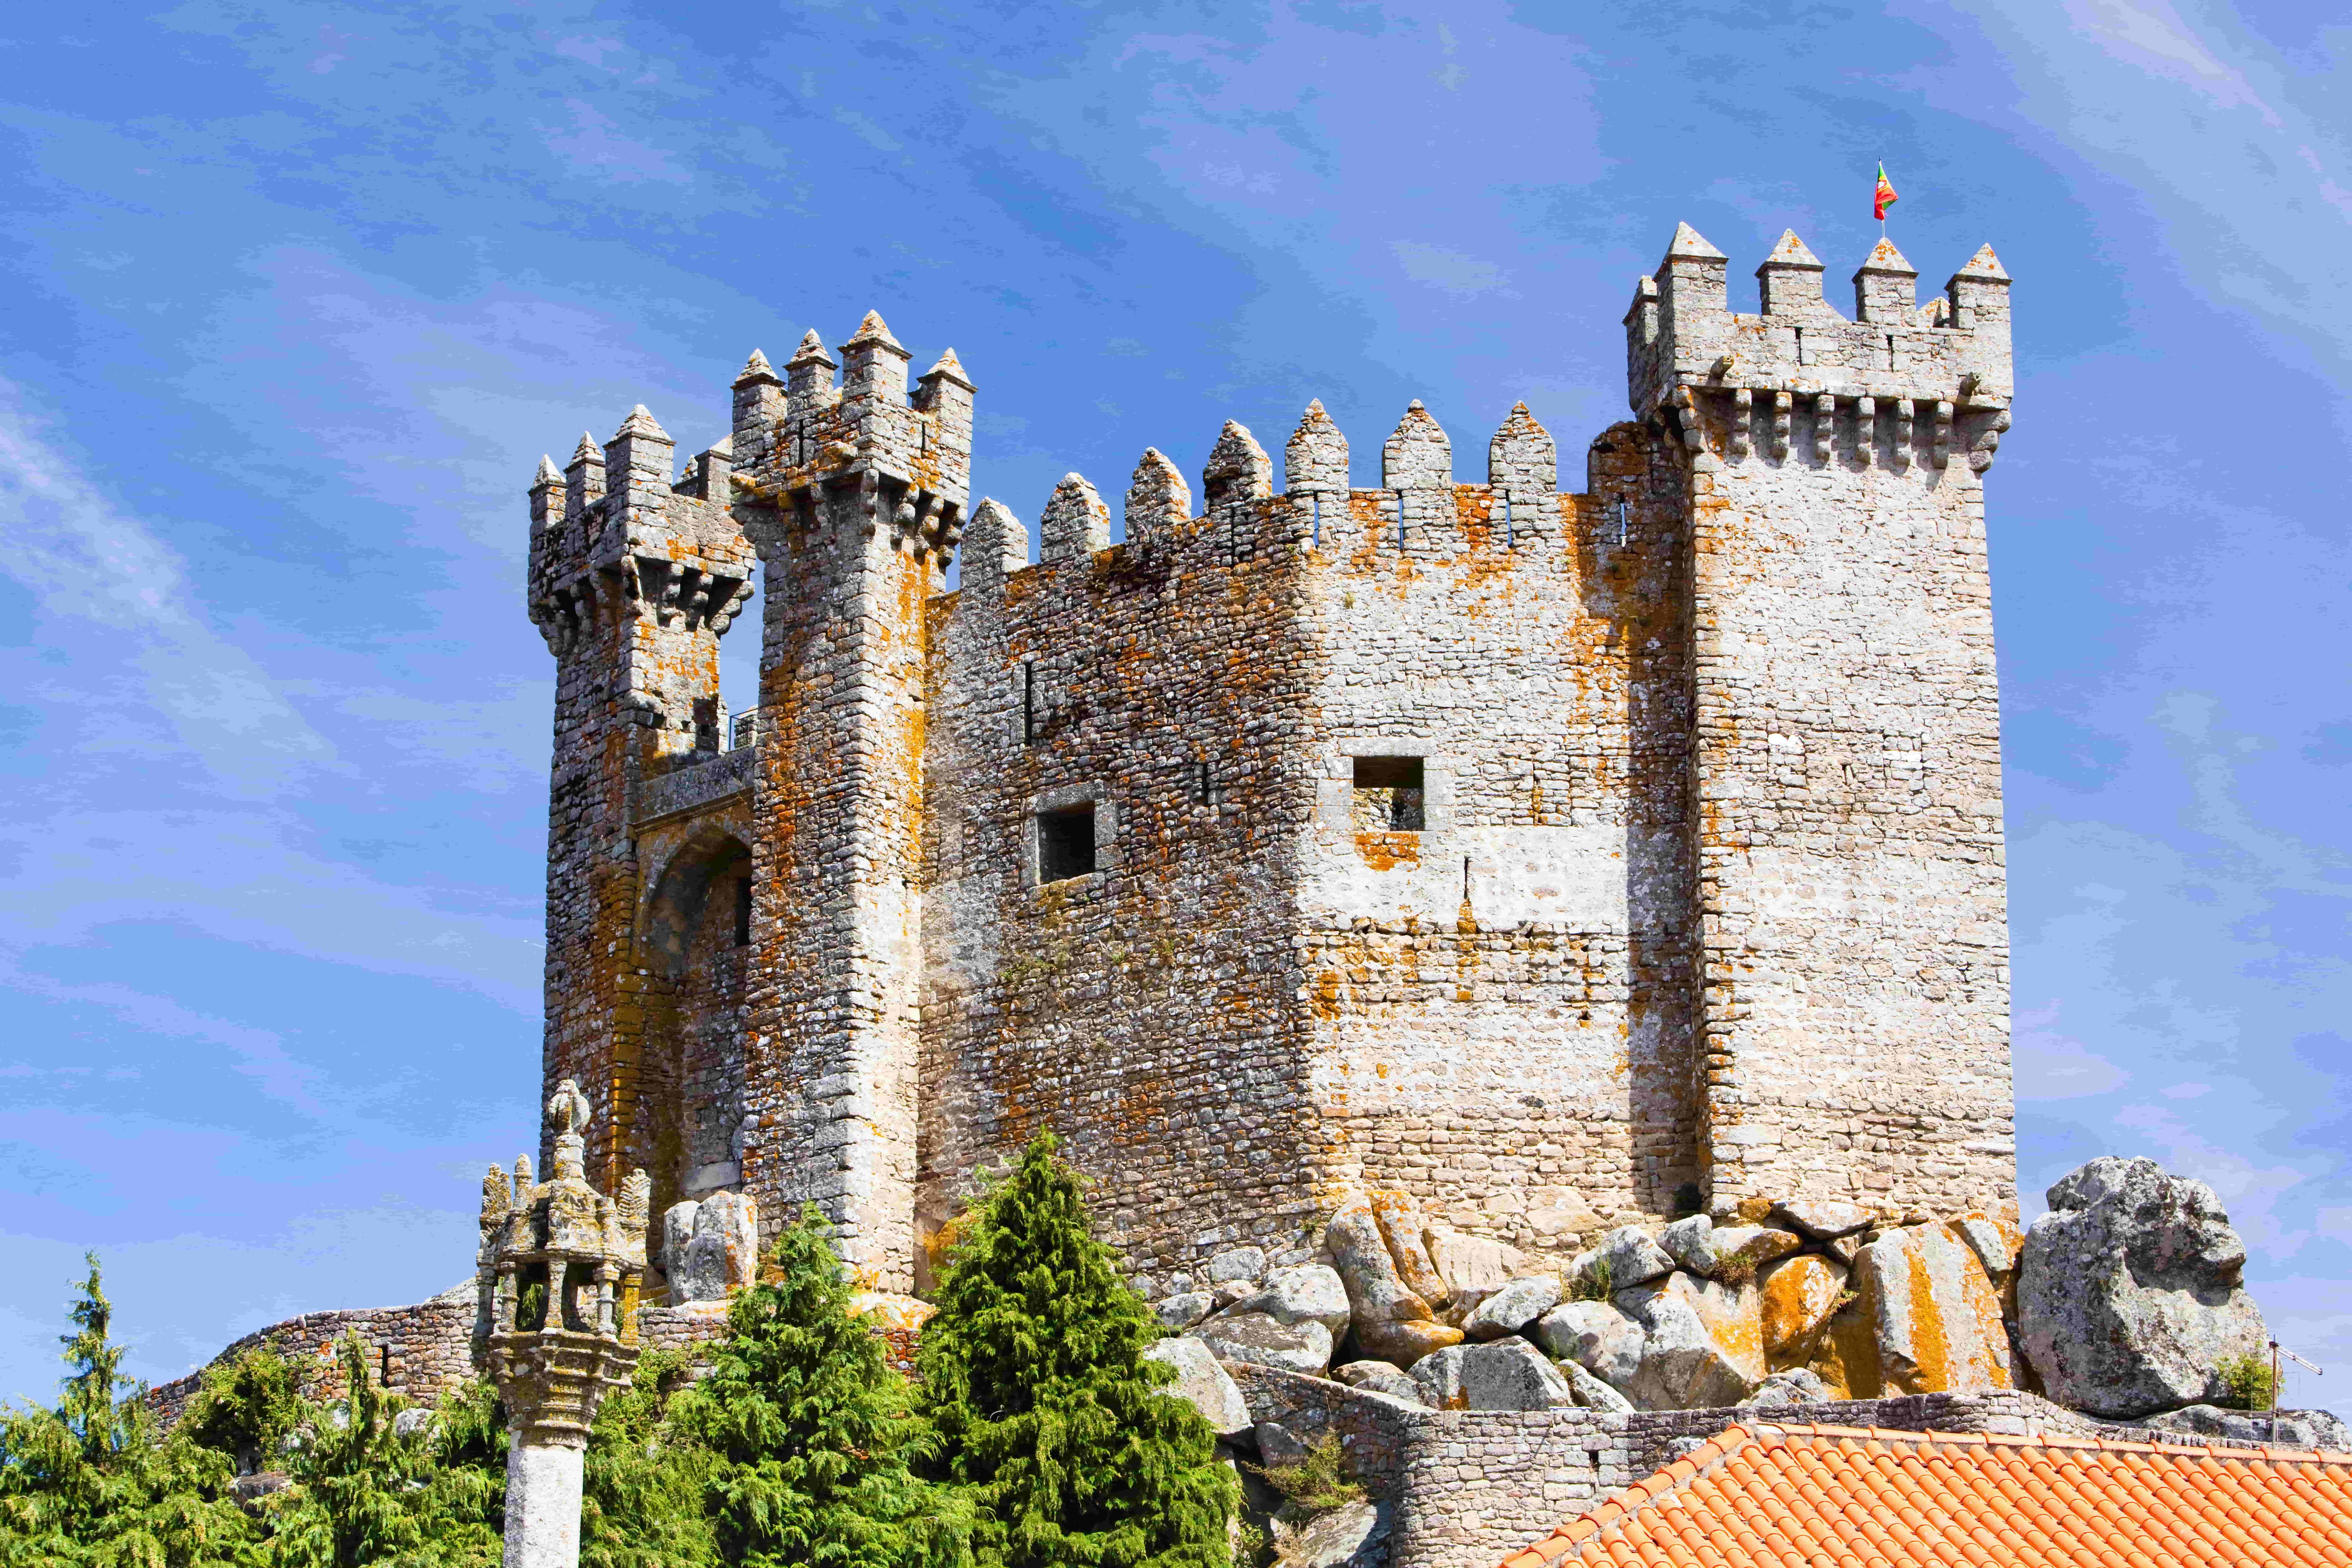 The castle of Penedono in the Terras de CIster region